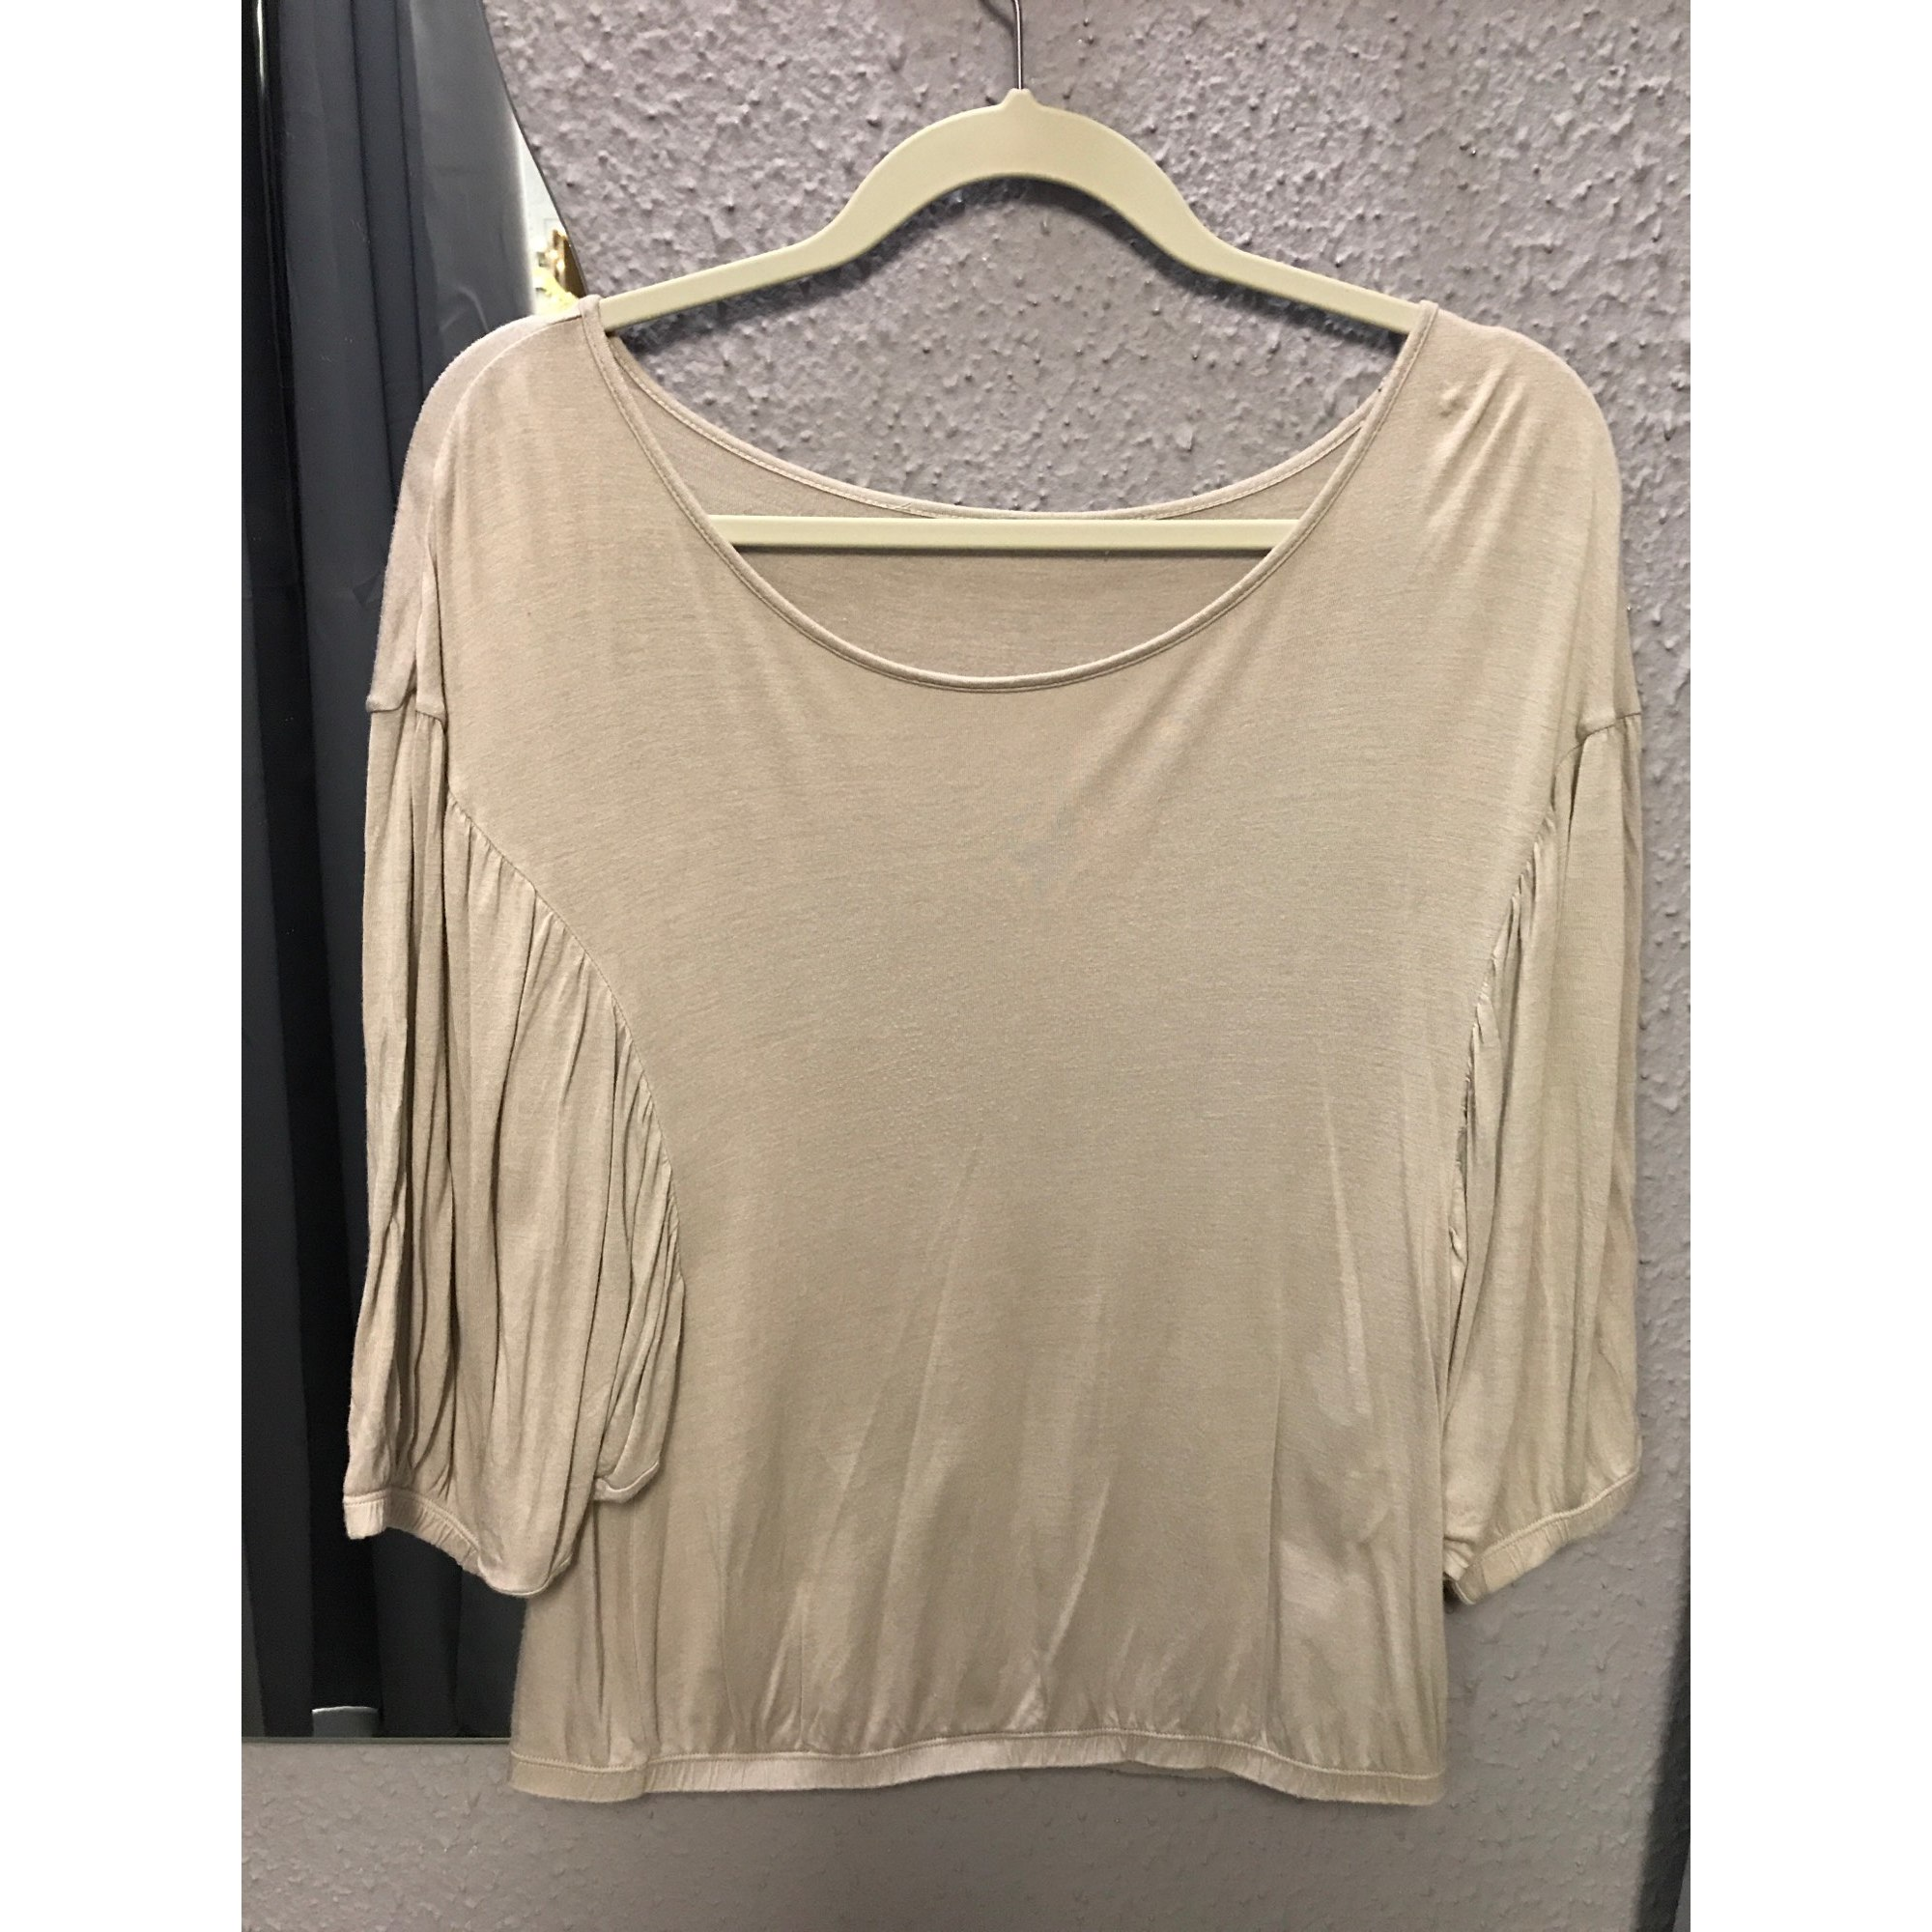 Top, tee-shirt ETAM Beige, camel